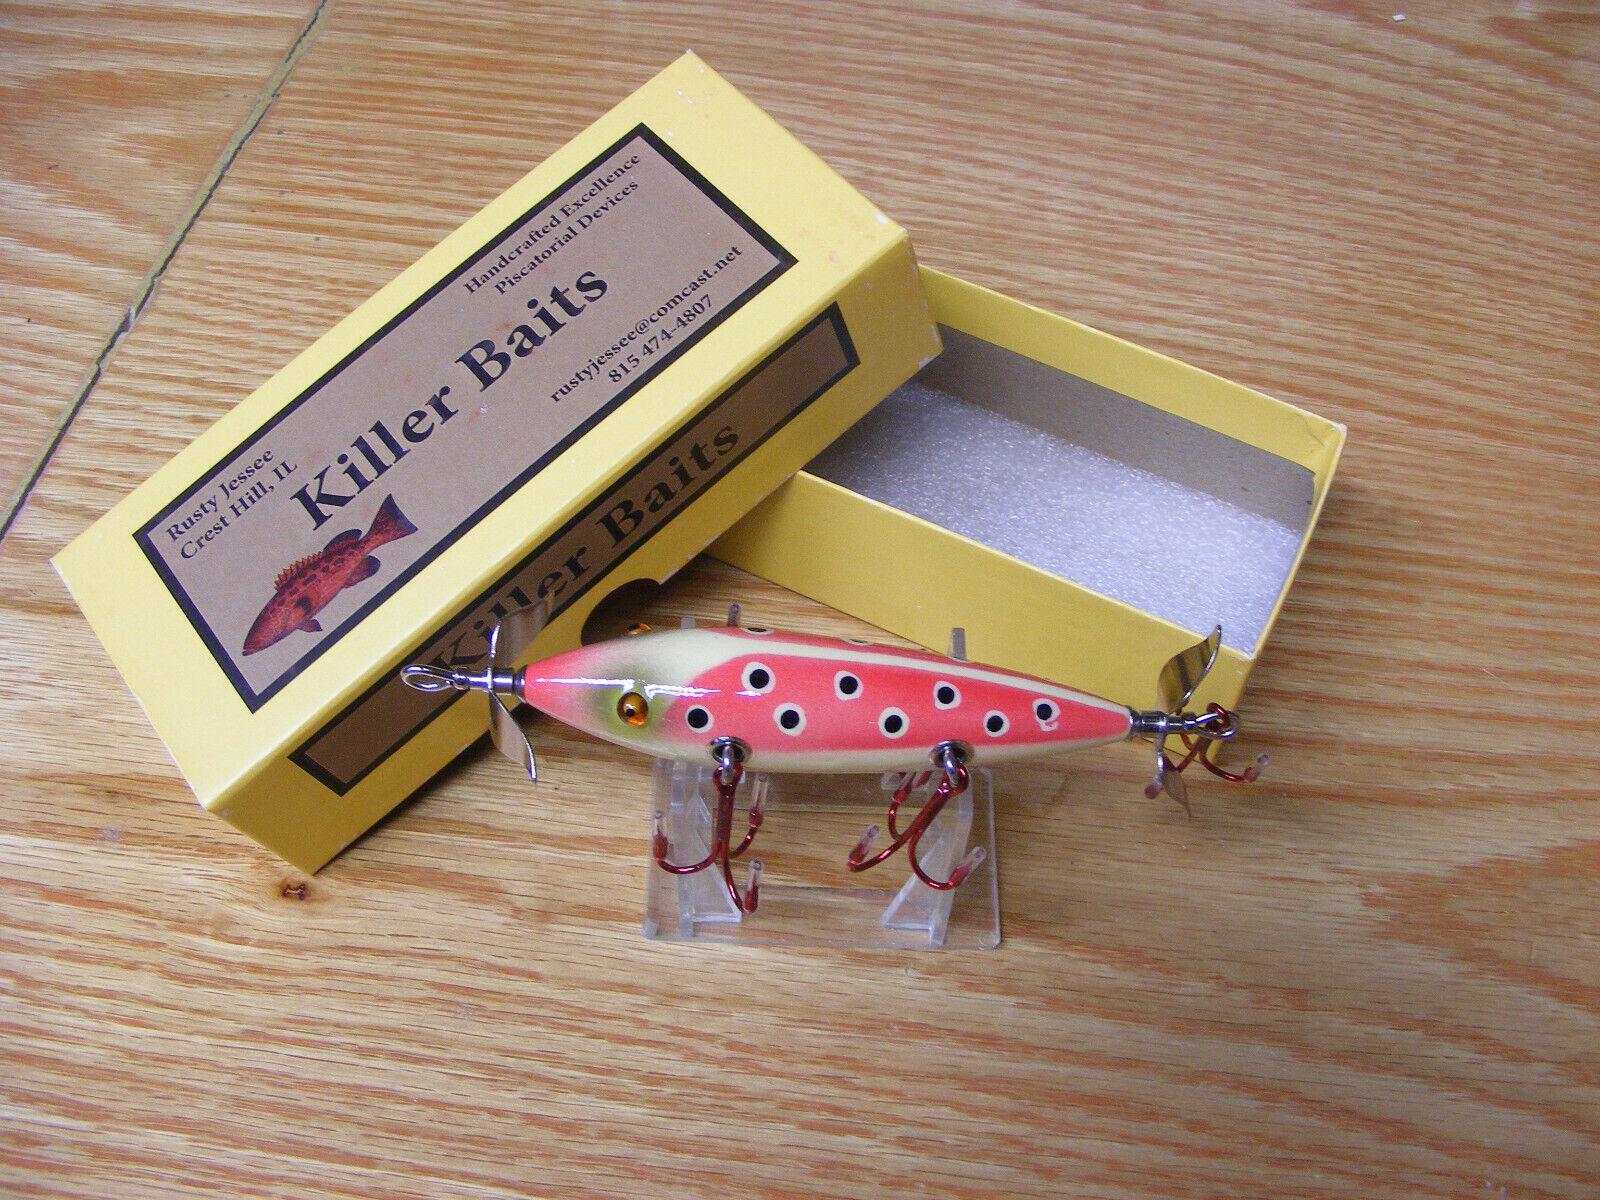 Killer Baits Rusty Jessee Heddon Little Sac Style Glasseye 150 in Red Ladybug